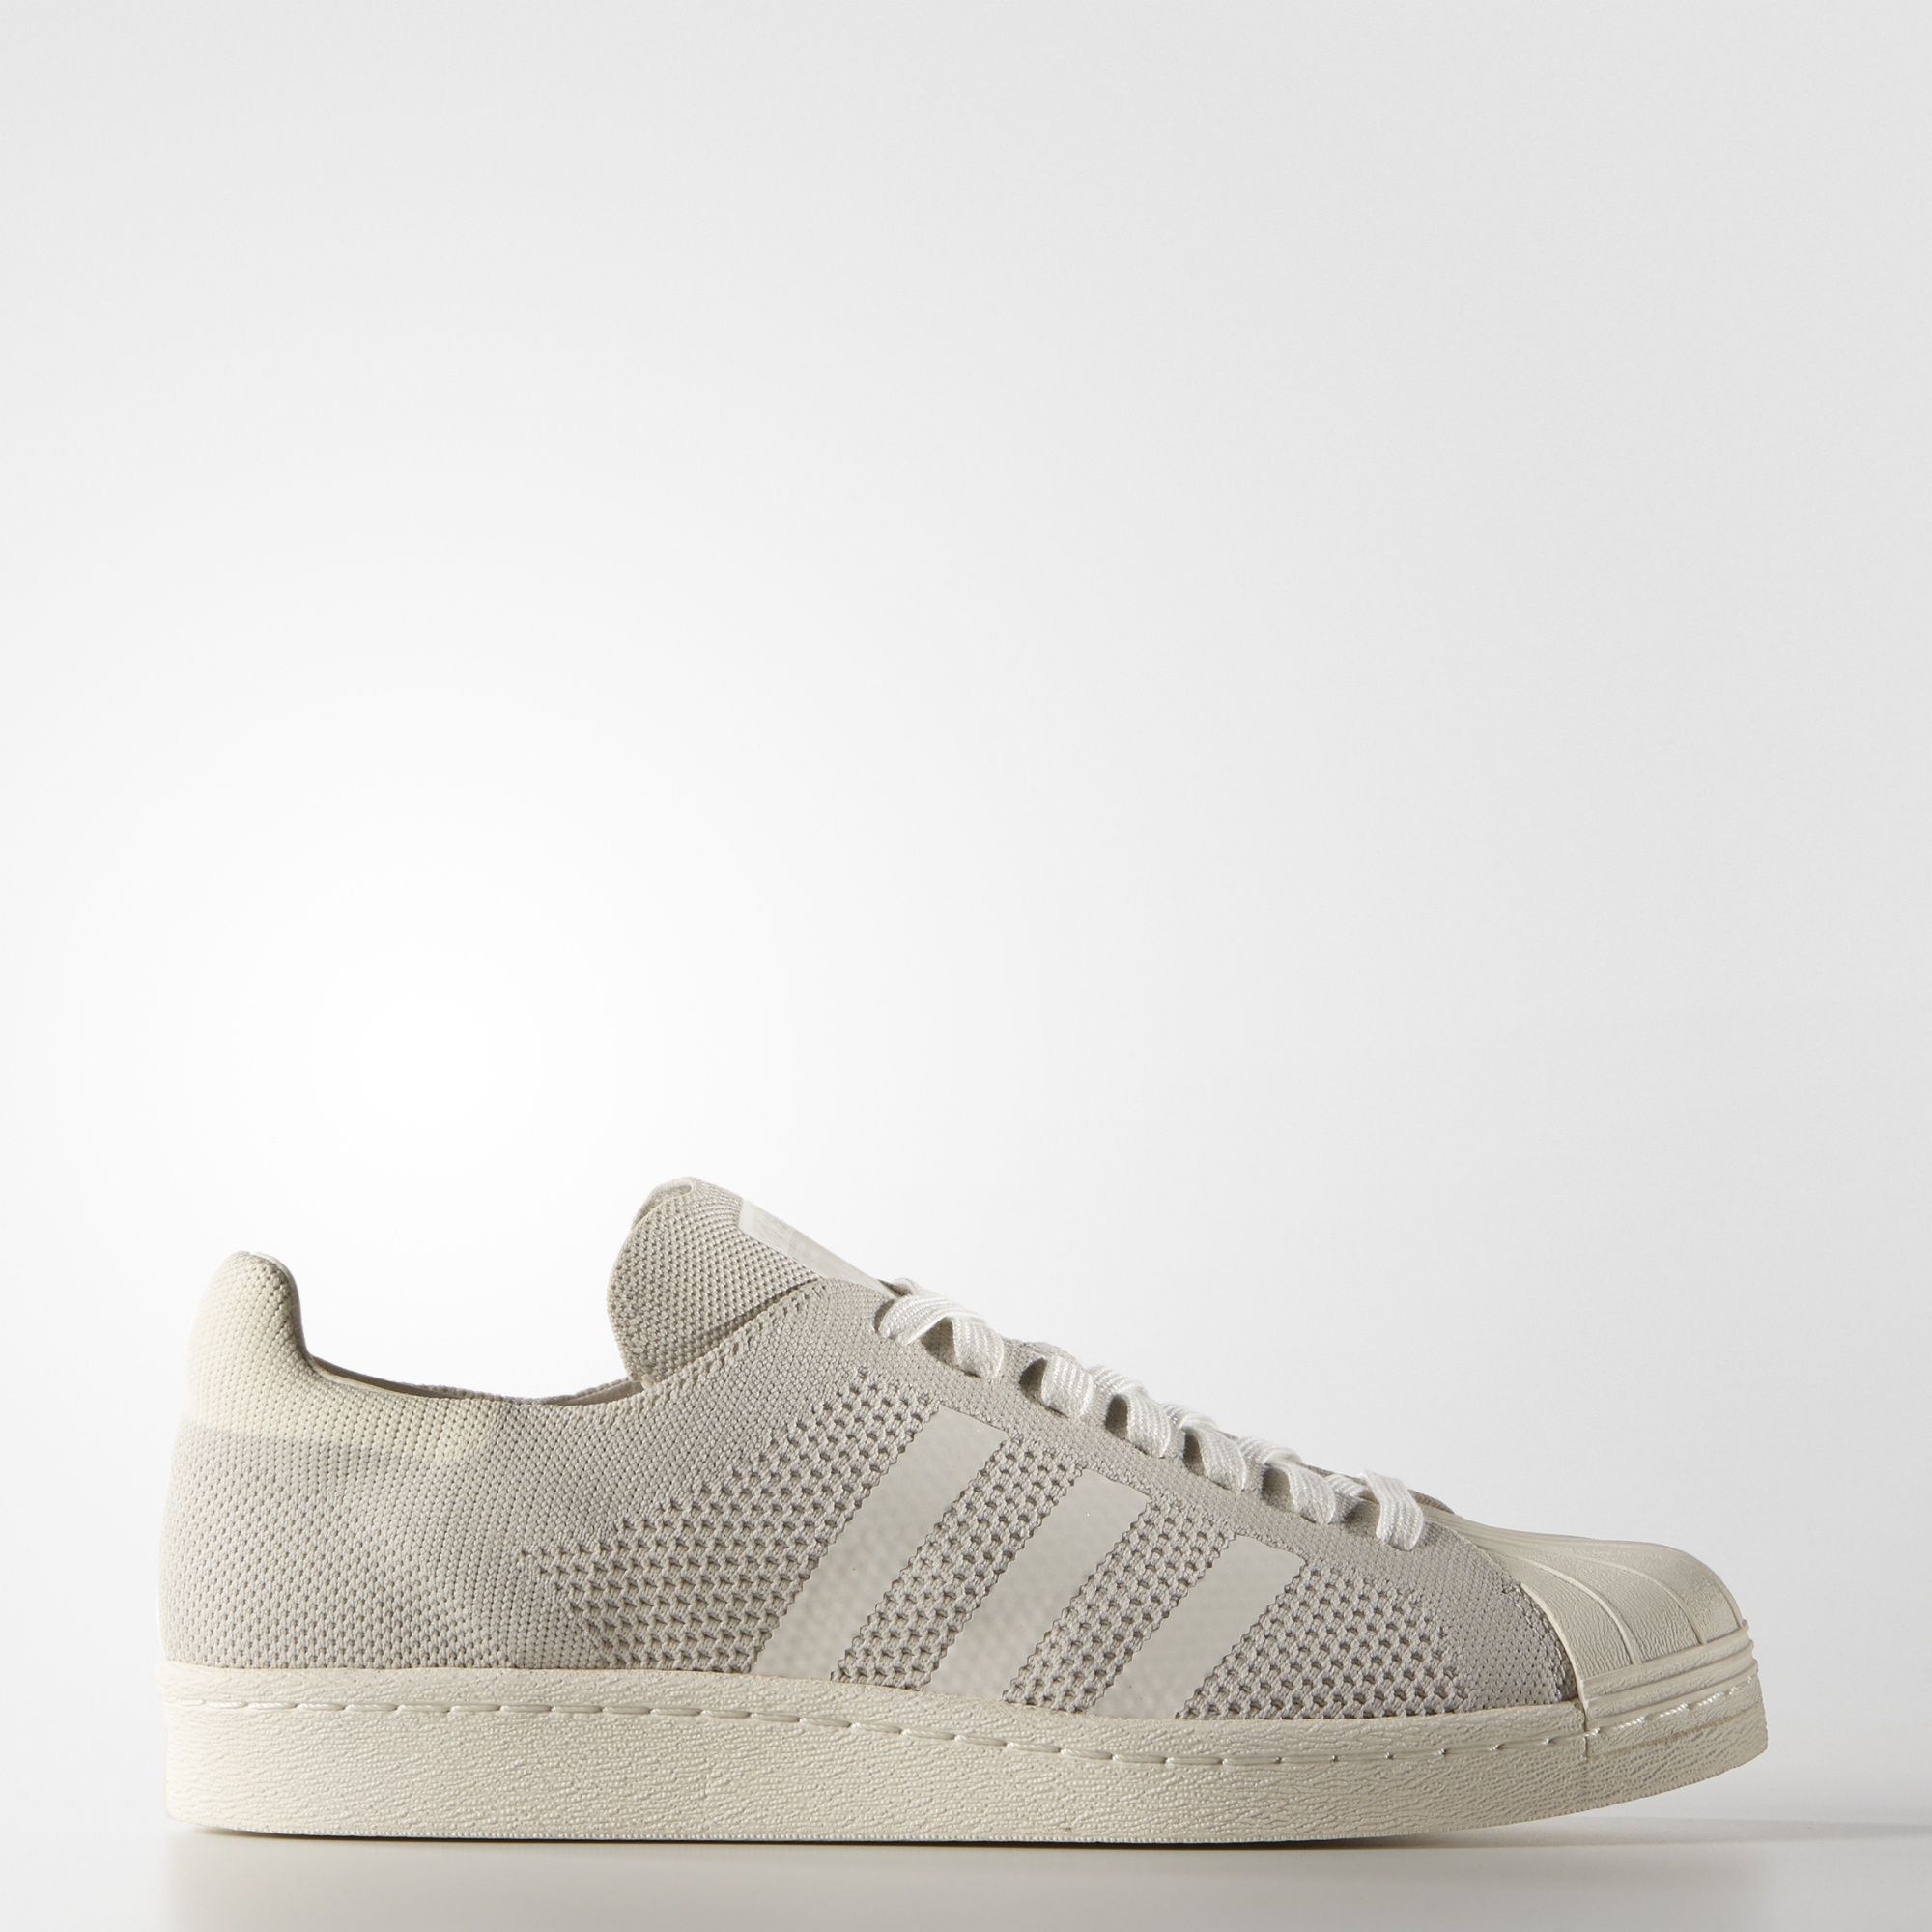 ceny odprawy Nowa lista Kup online adidas originals superstar 80s primeknit womens shoes